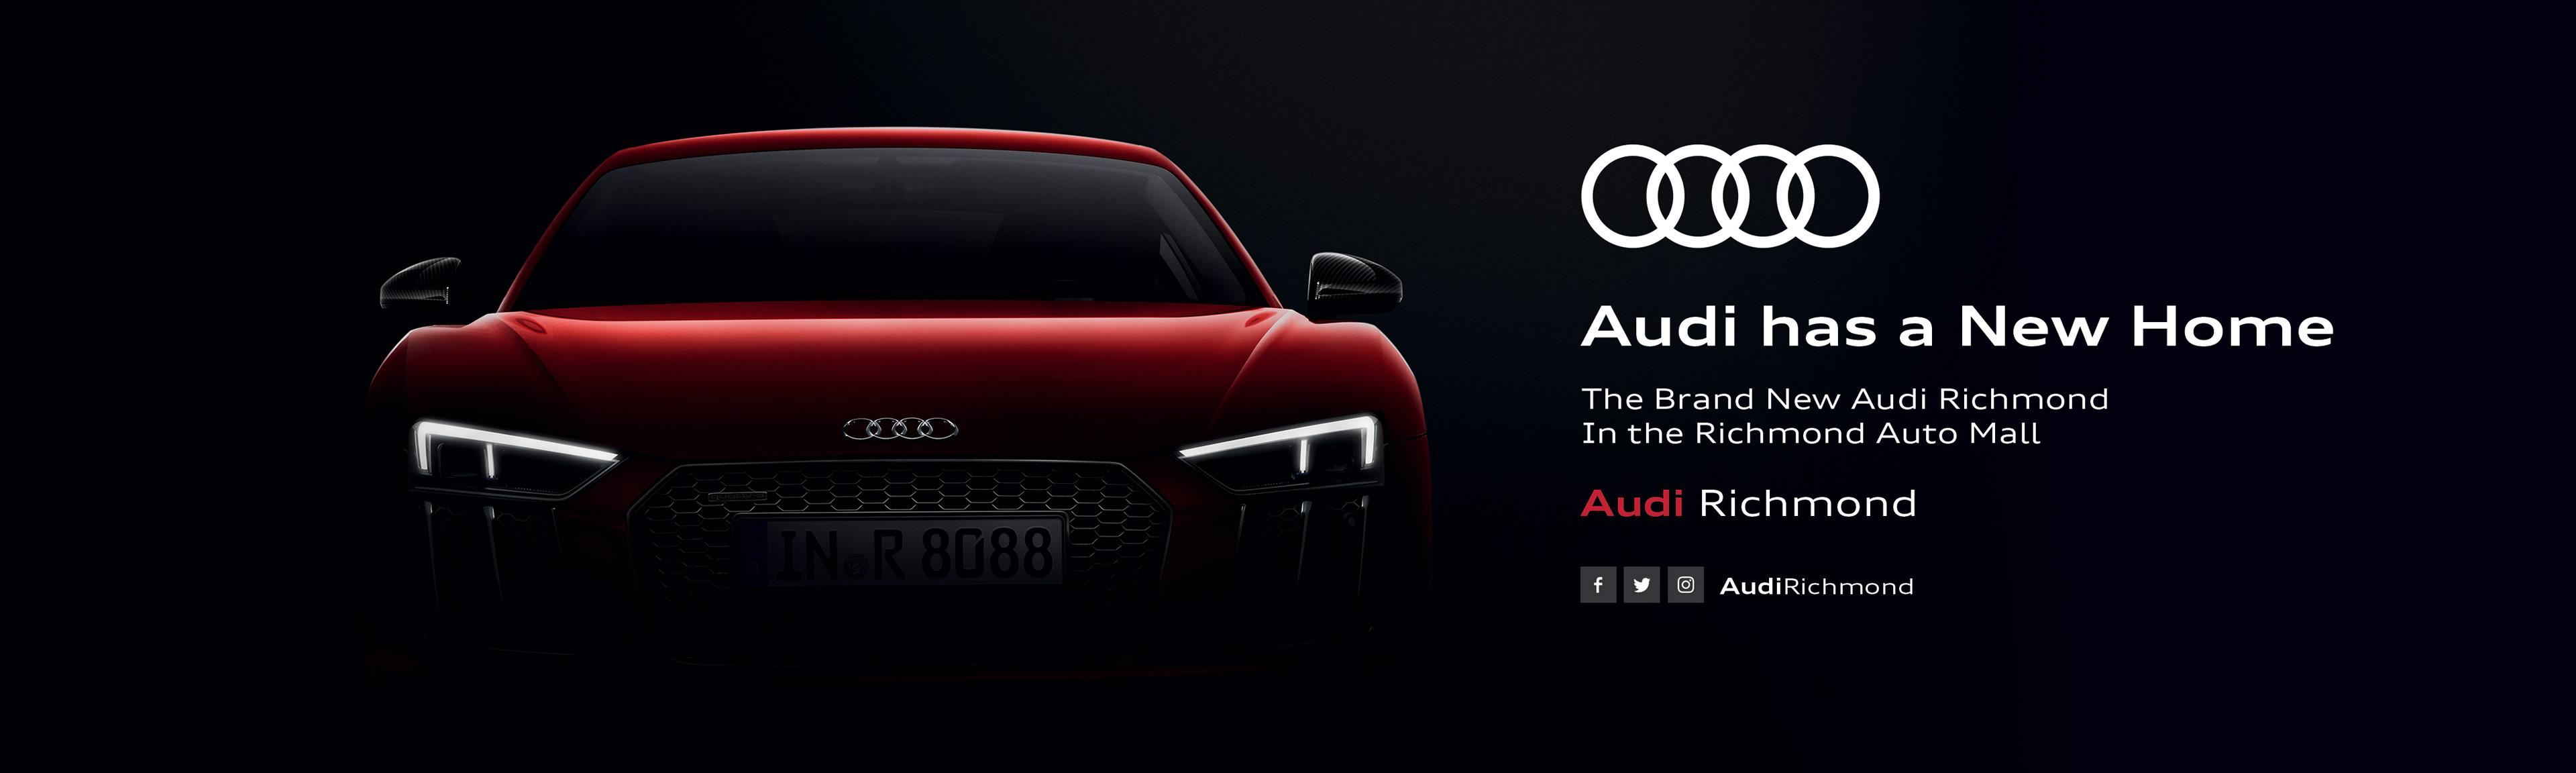 2016 Land Rover >> Billy Hur - Audi Richmond - Transit Advertising